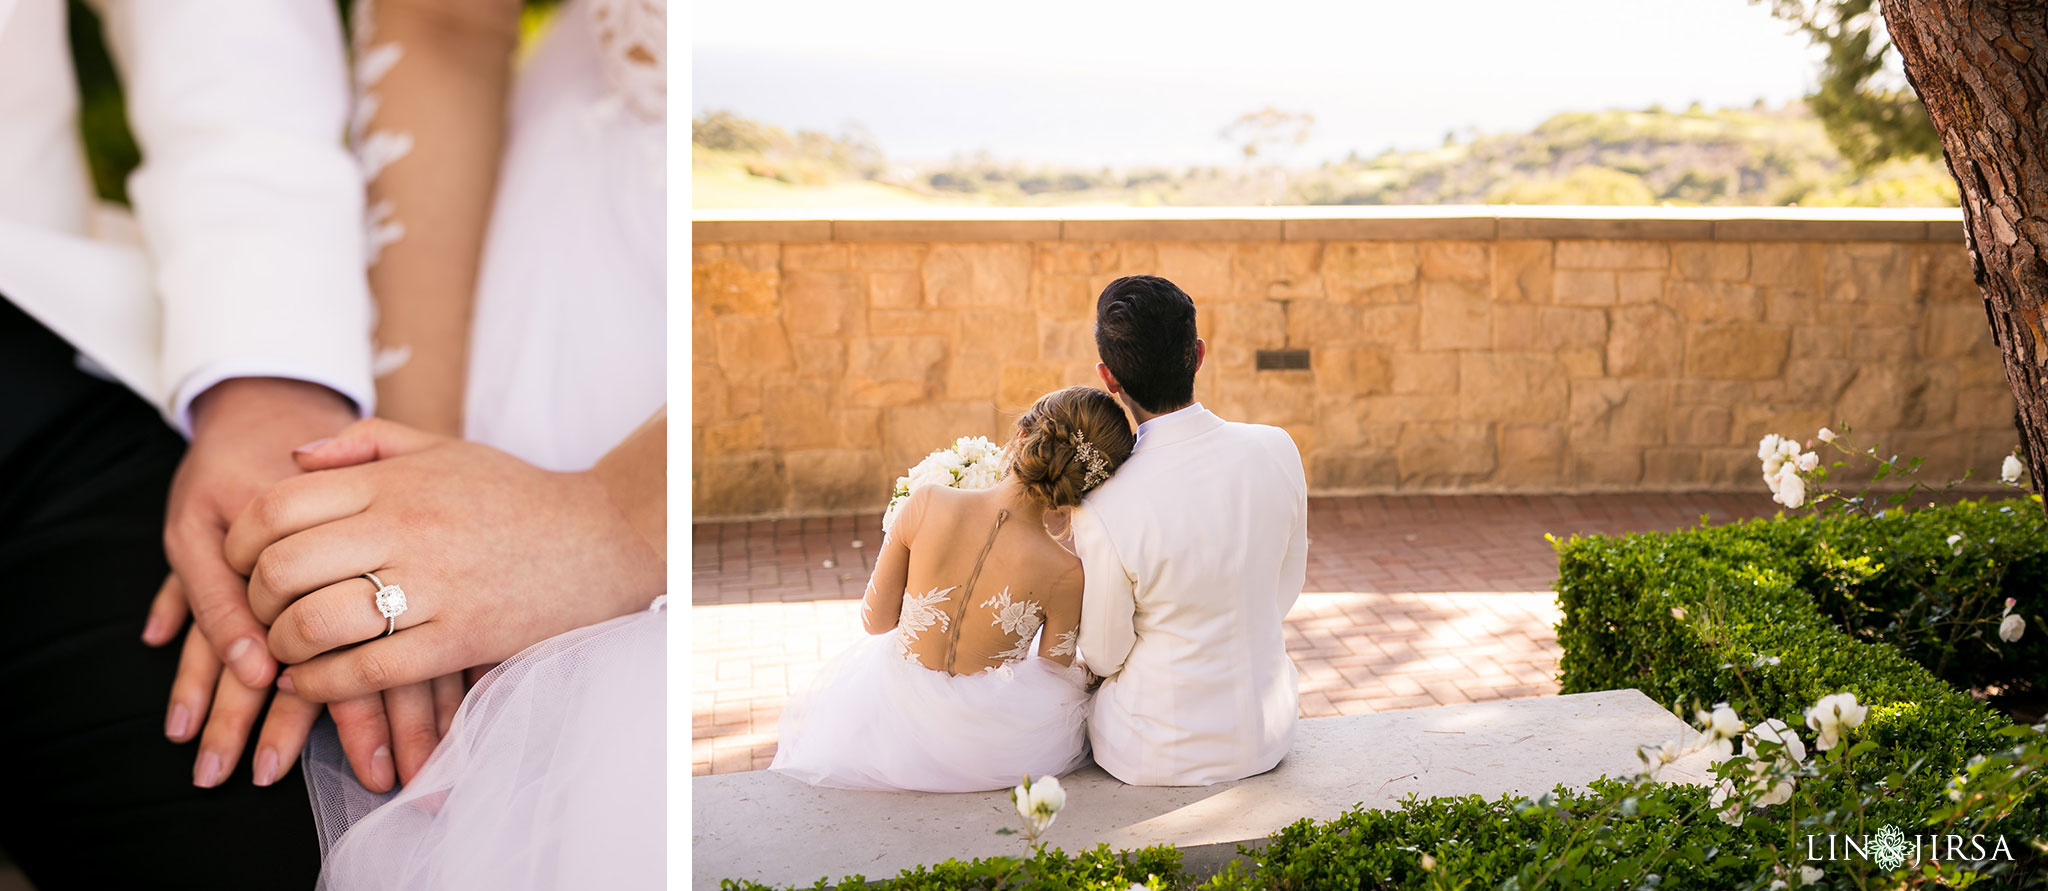 10 pelican hill resort orange county wedding photography